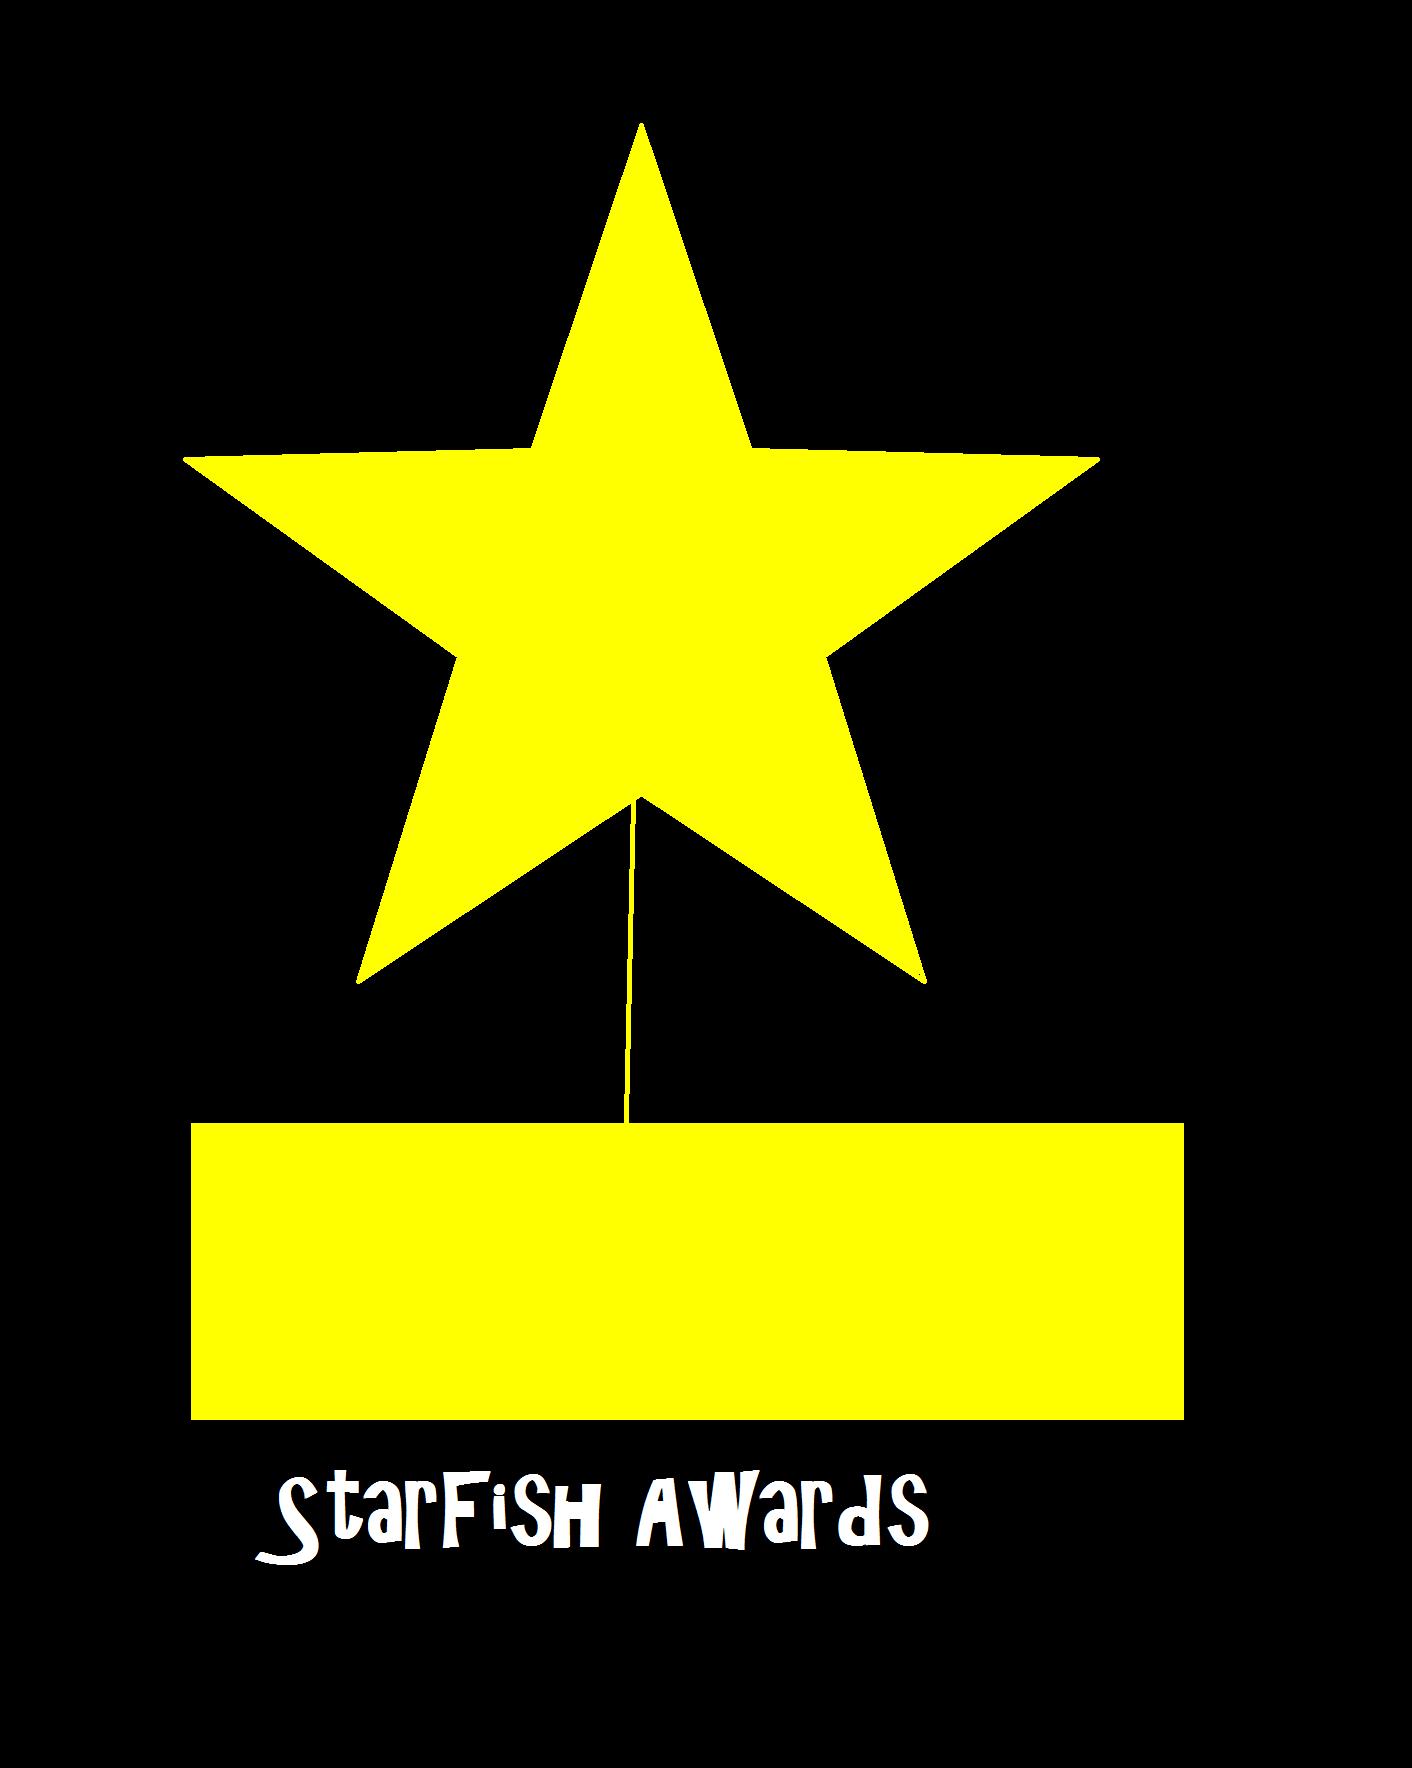 Starfish Awards